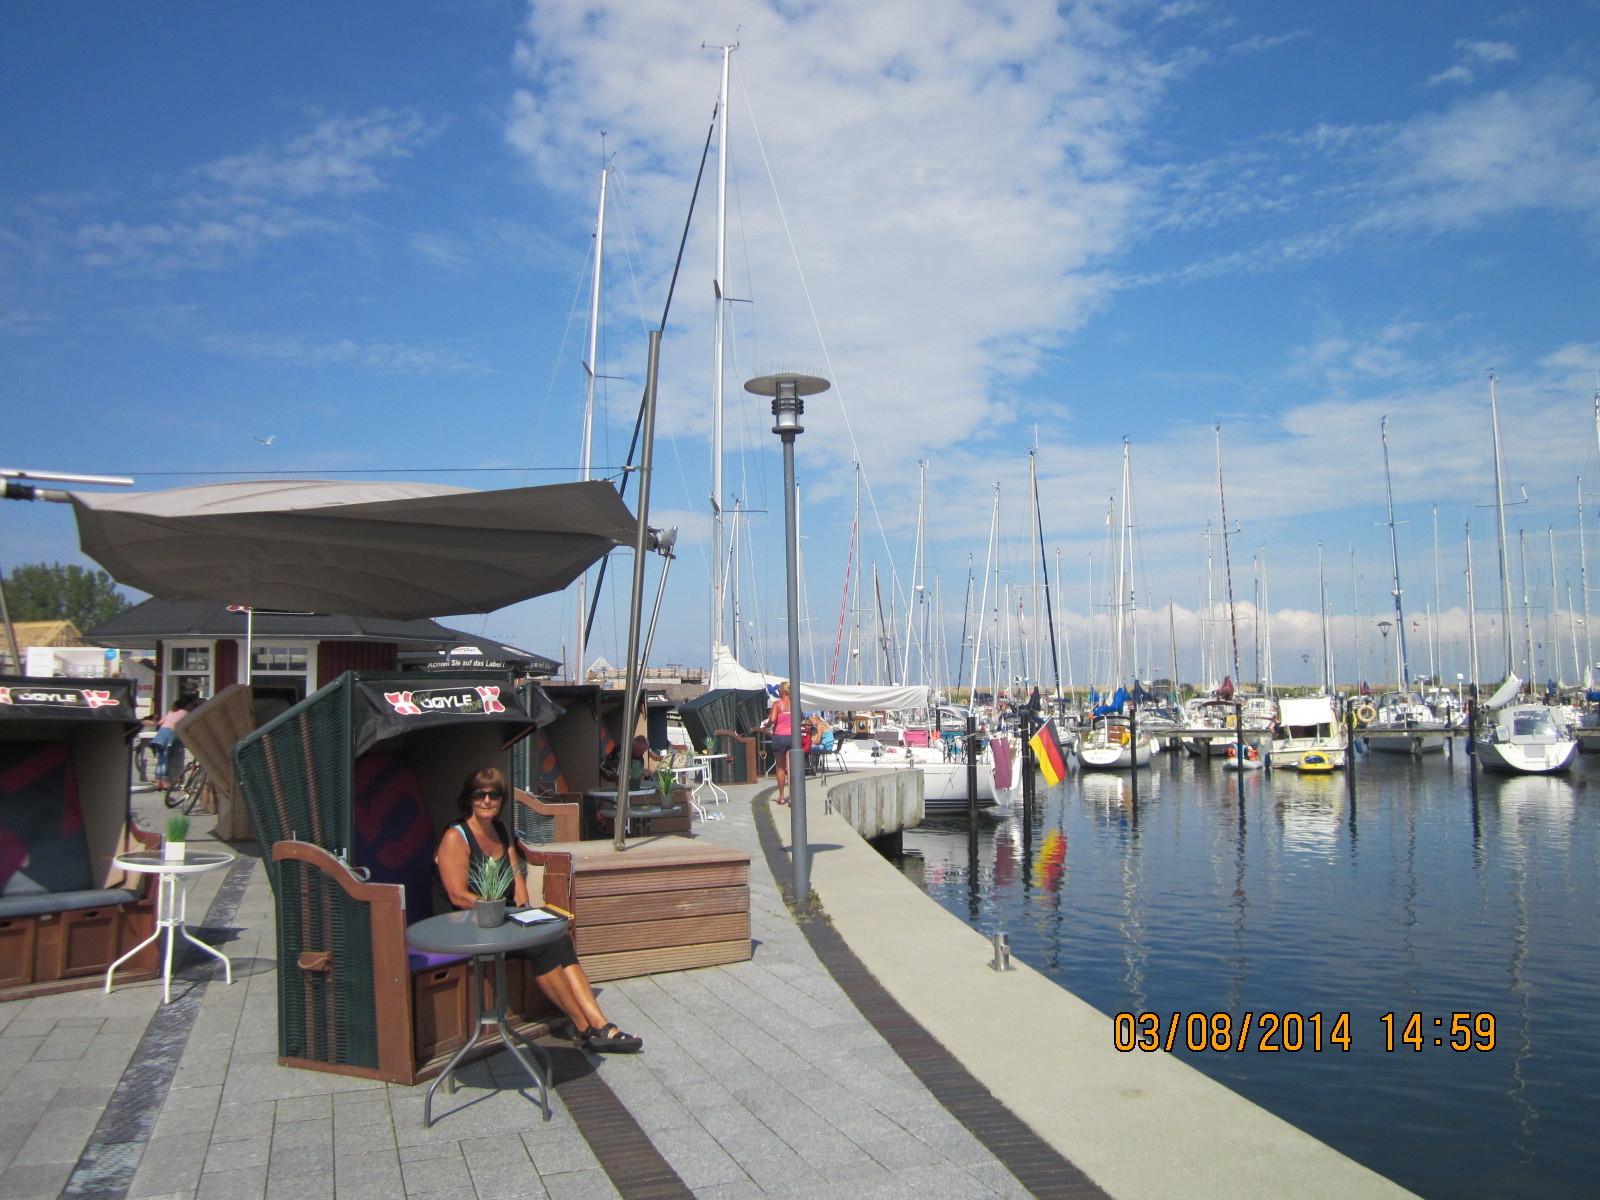 Promenade entlang dem Hafen